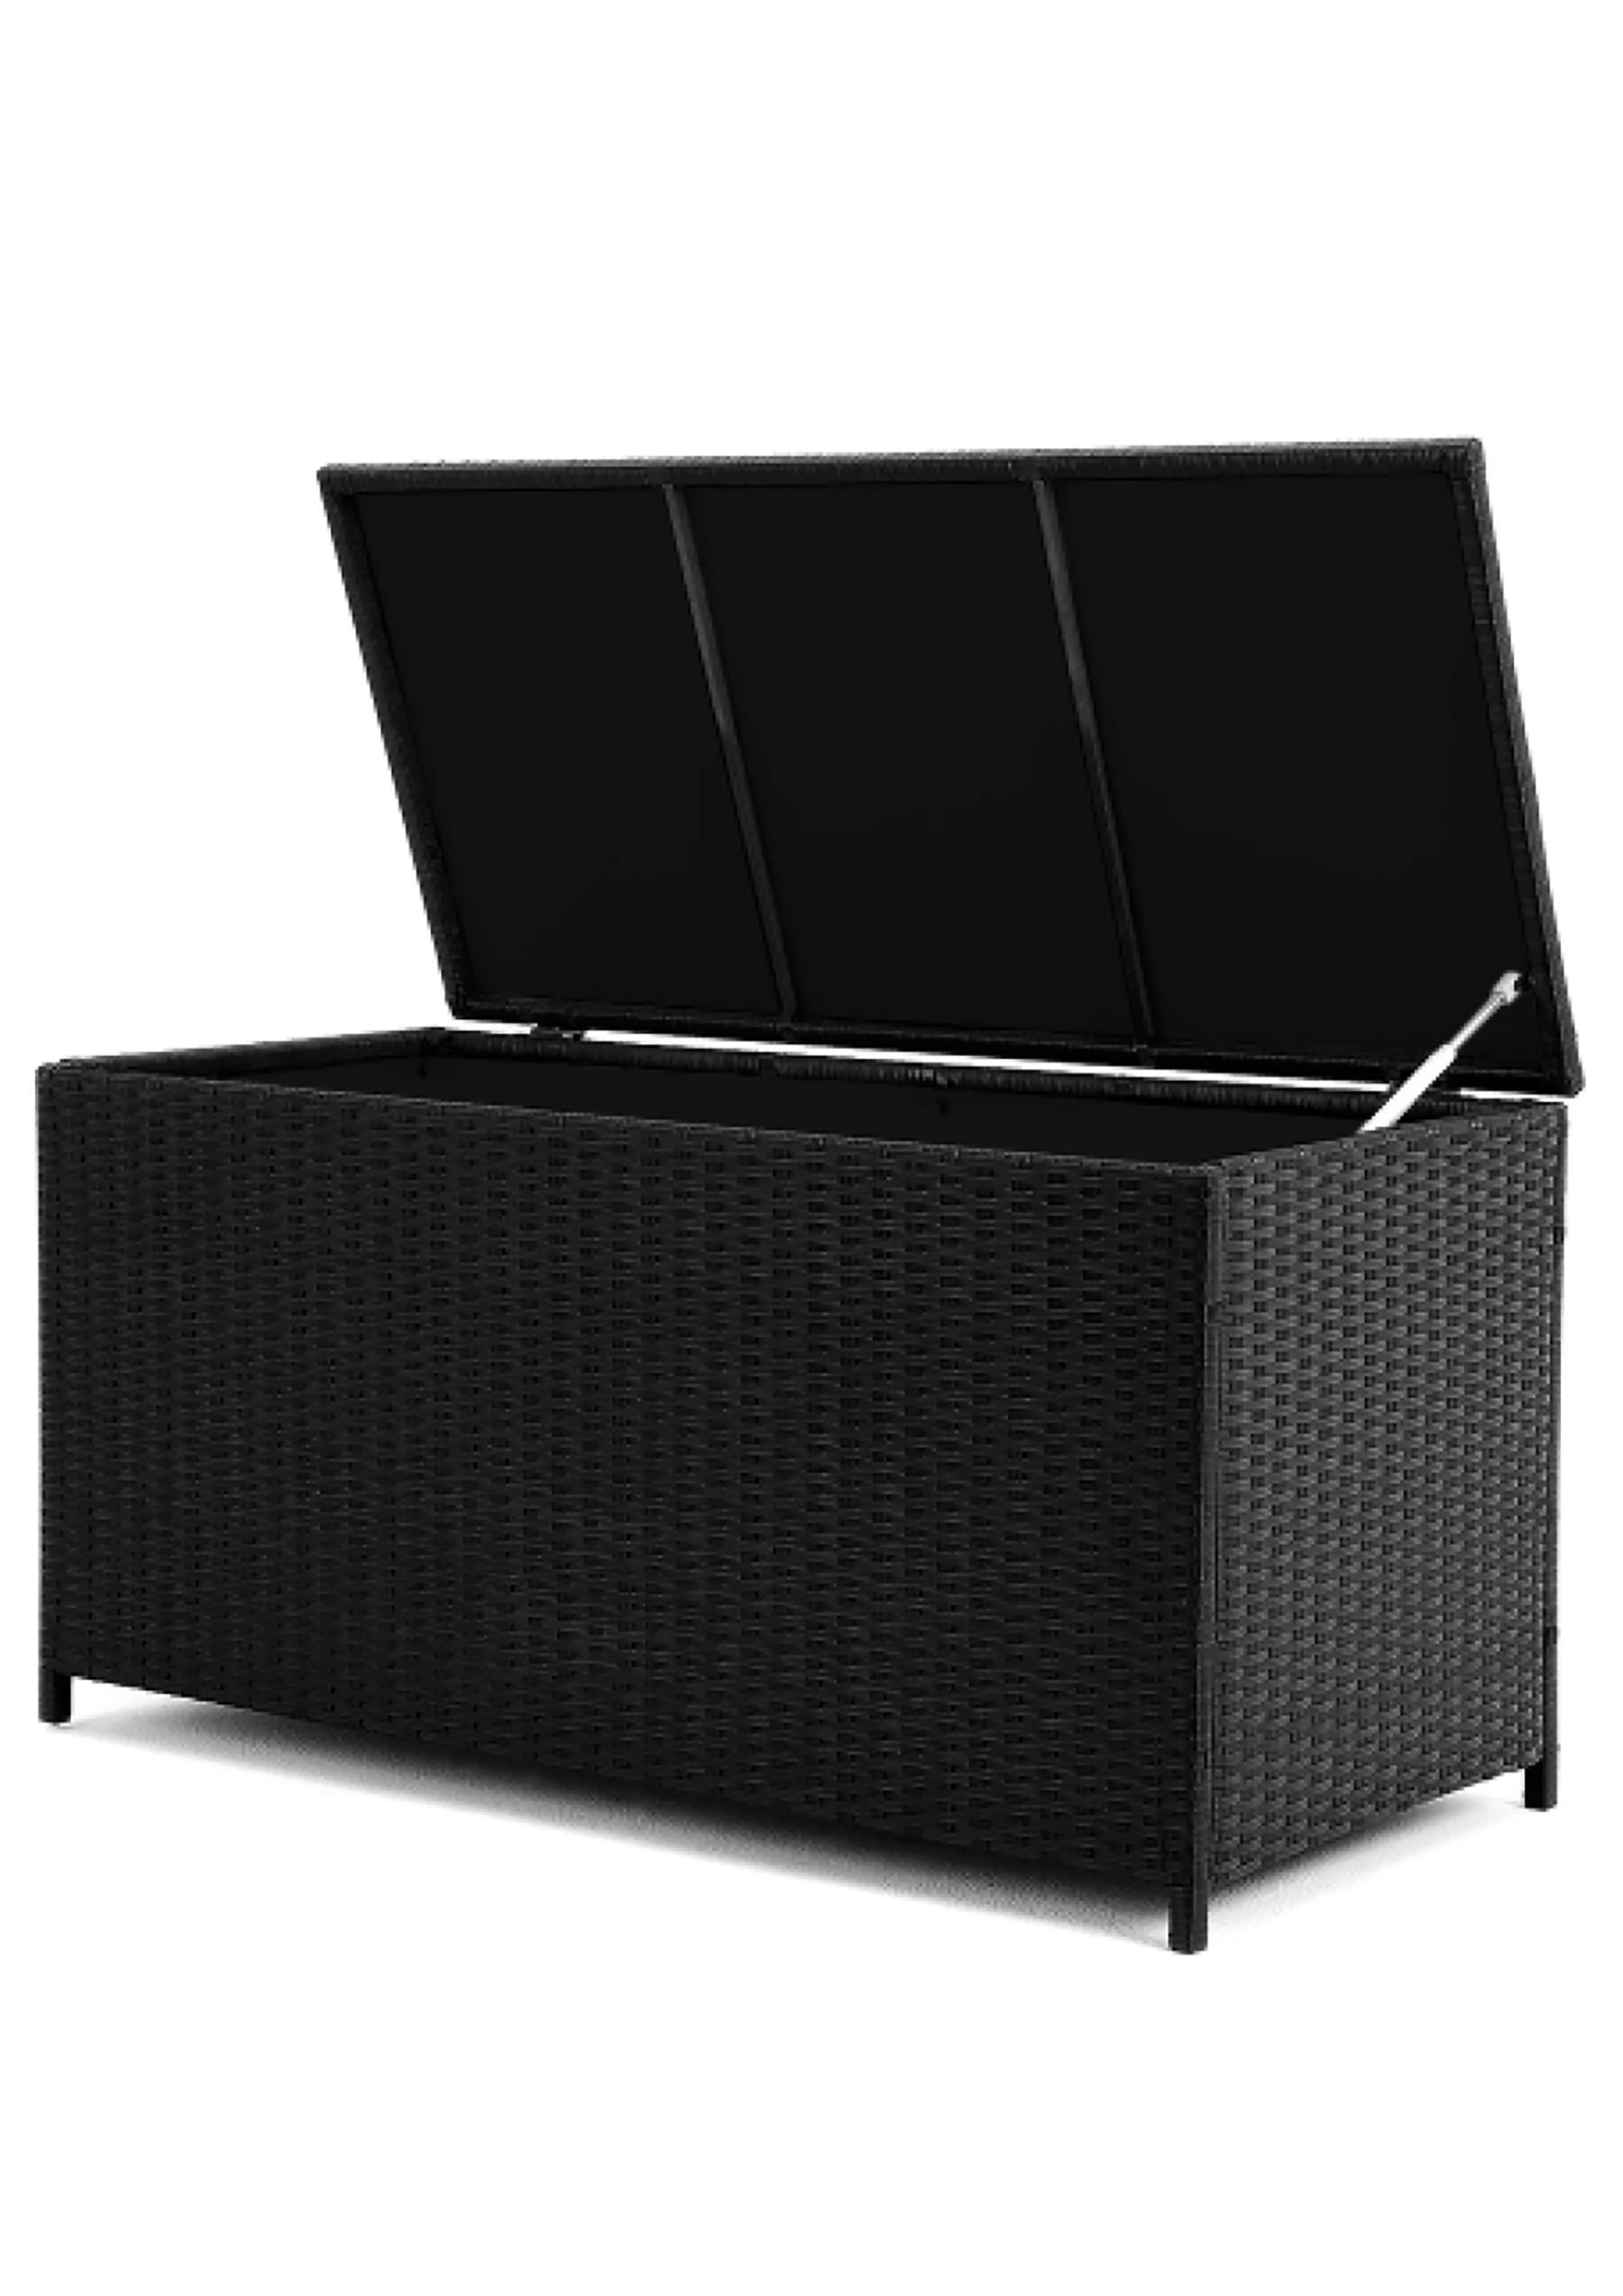 gartenbox rattan dietschys gmbh. Black Bedroom Furniture Sets. Home Design Ideas